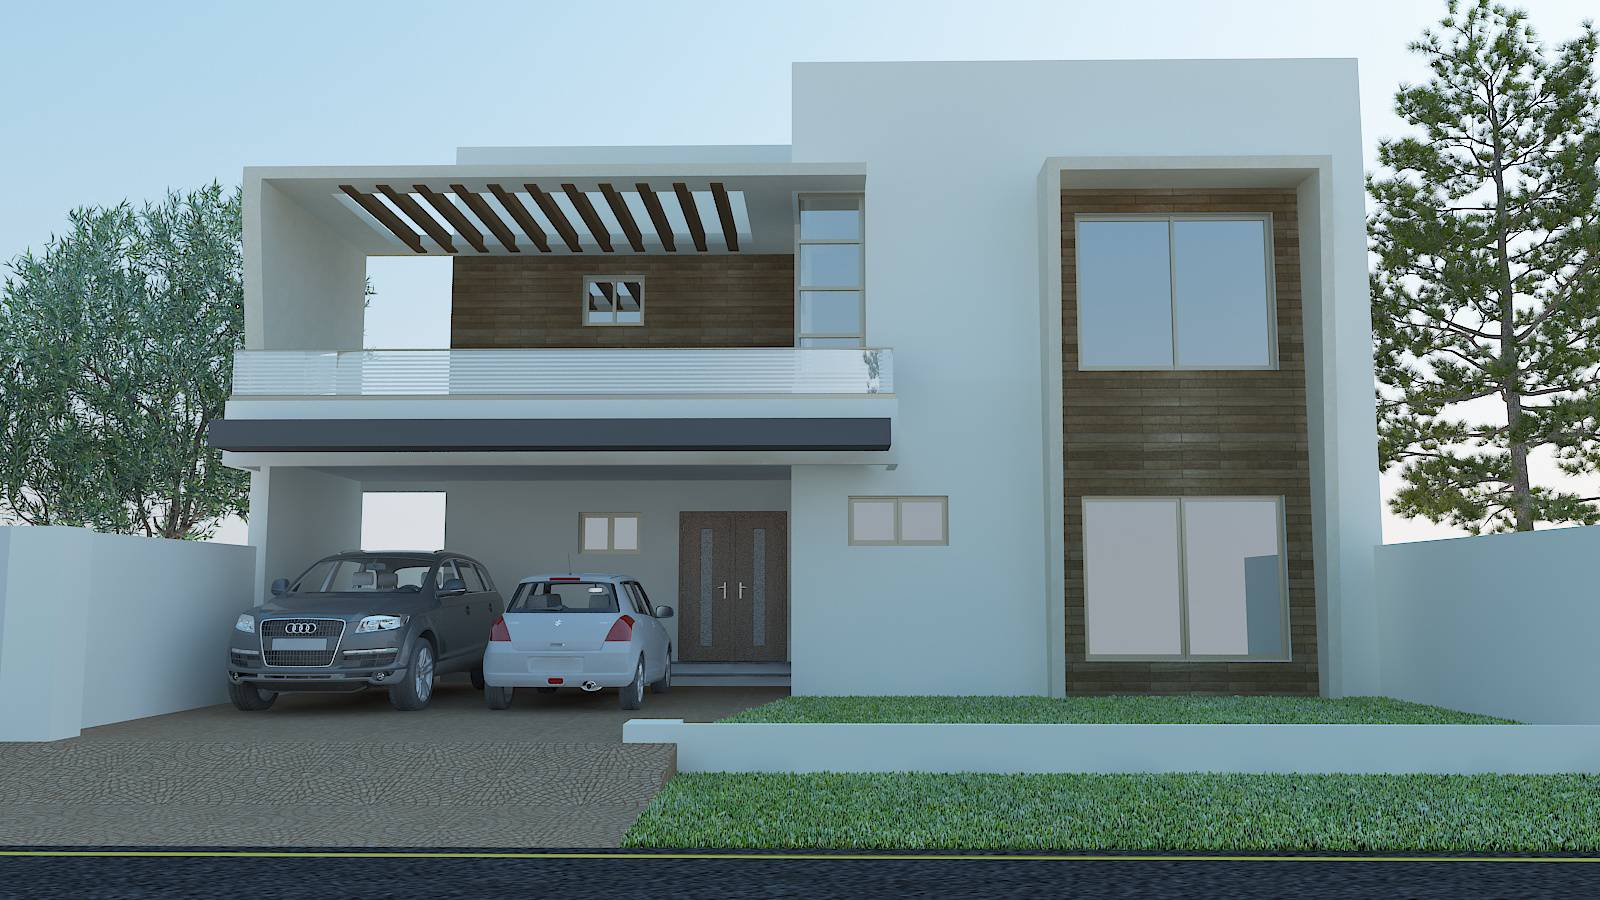 Desain Rumah Type 45 Minimalis 2 Lantai